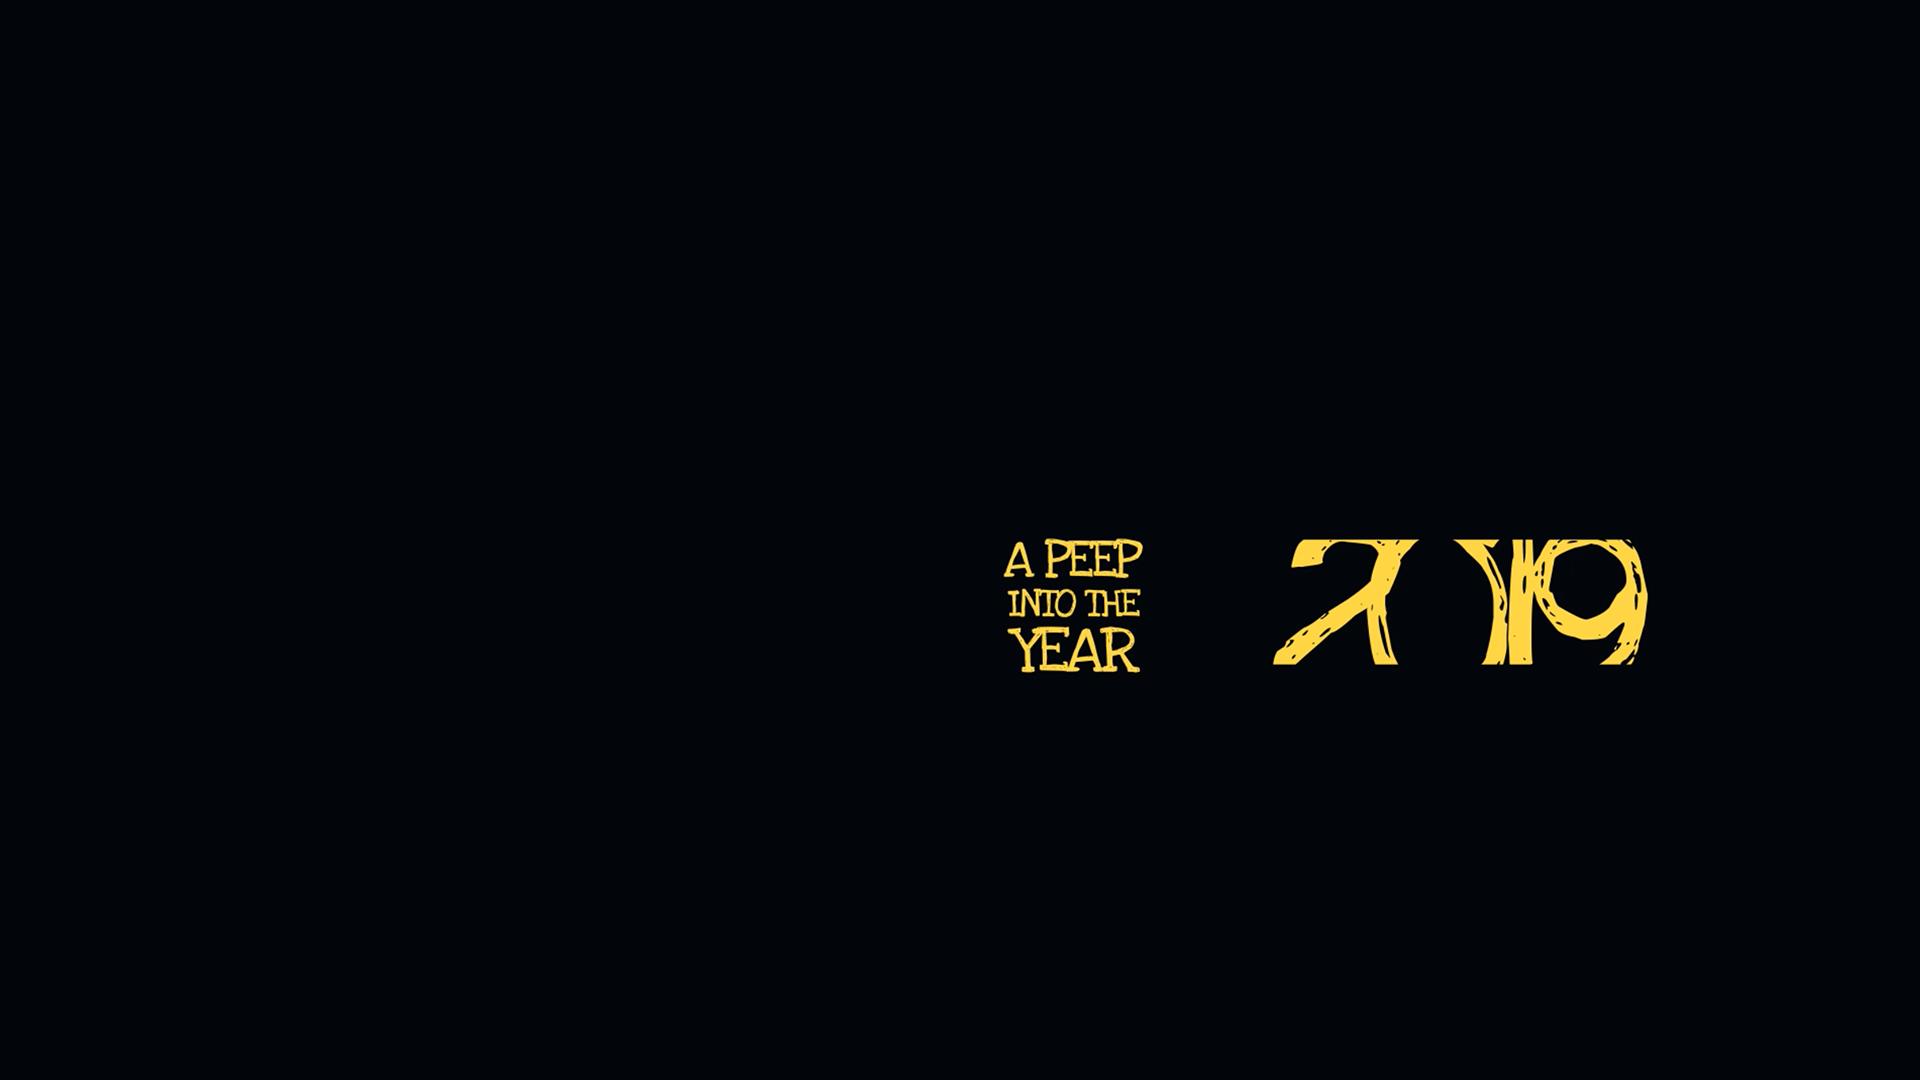 A peep into 2019